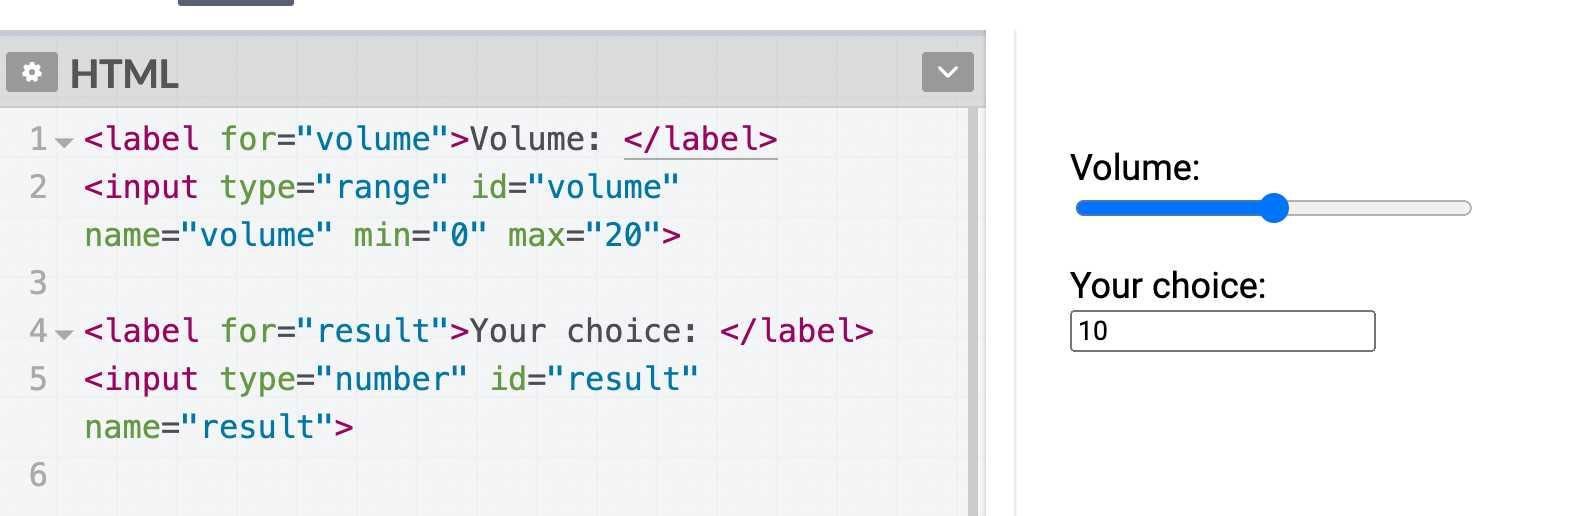 HTML 滑块